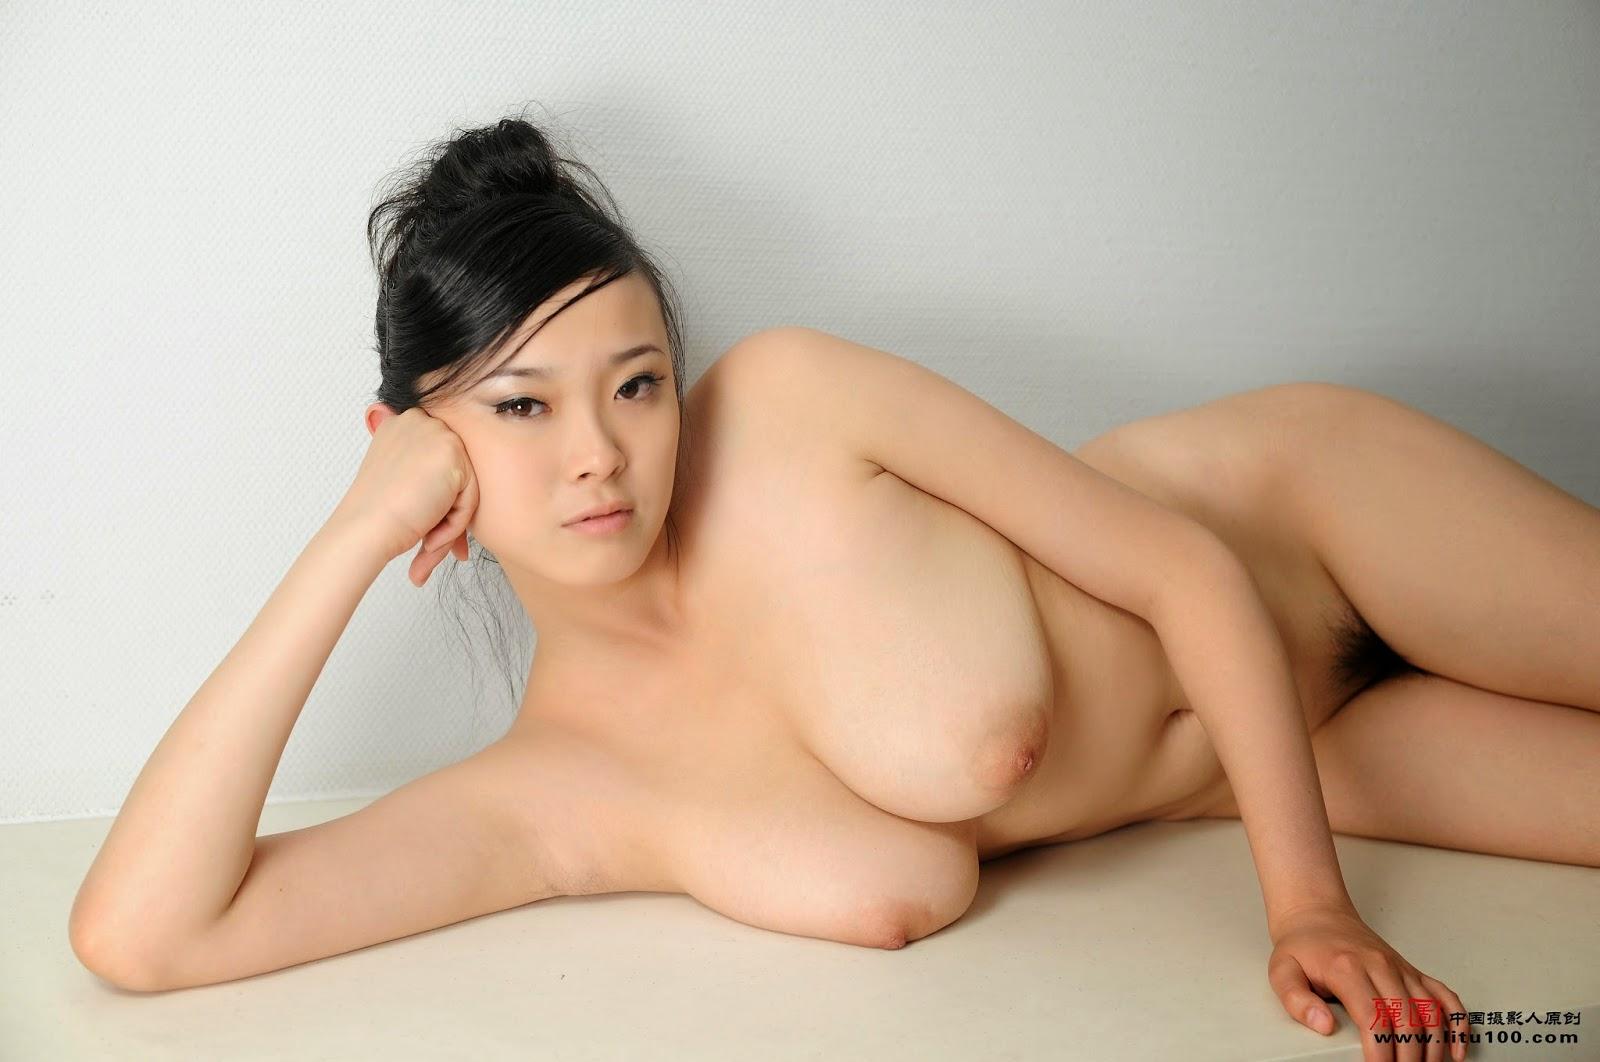 Desi Girl Sexy Pics Erotic Chinese Beauty-3492